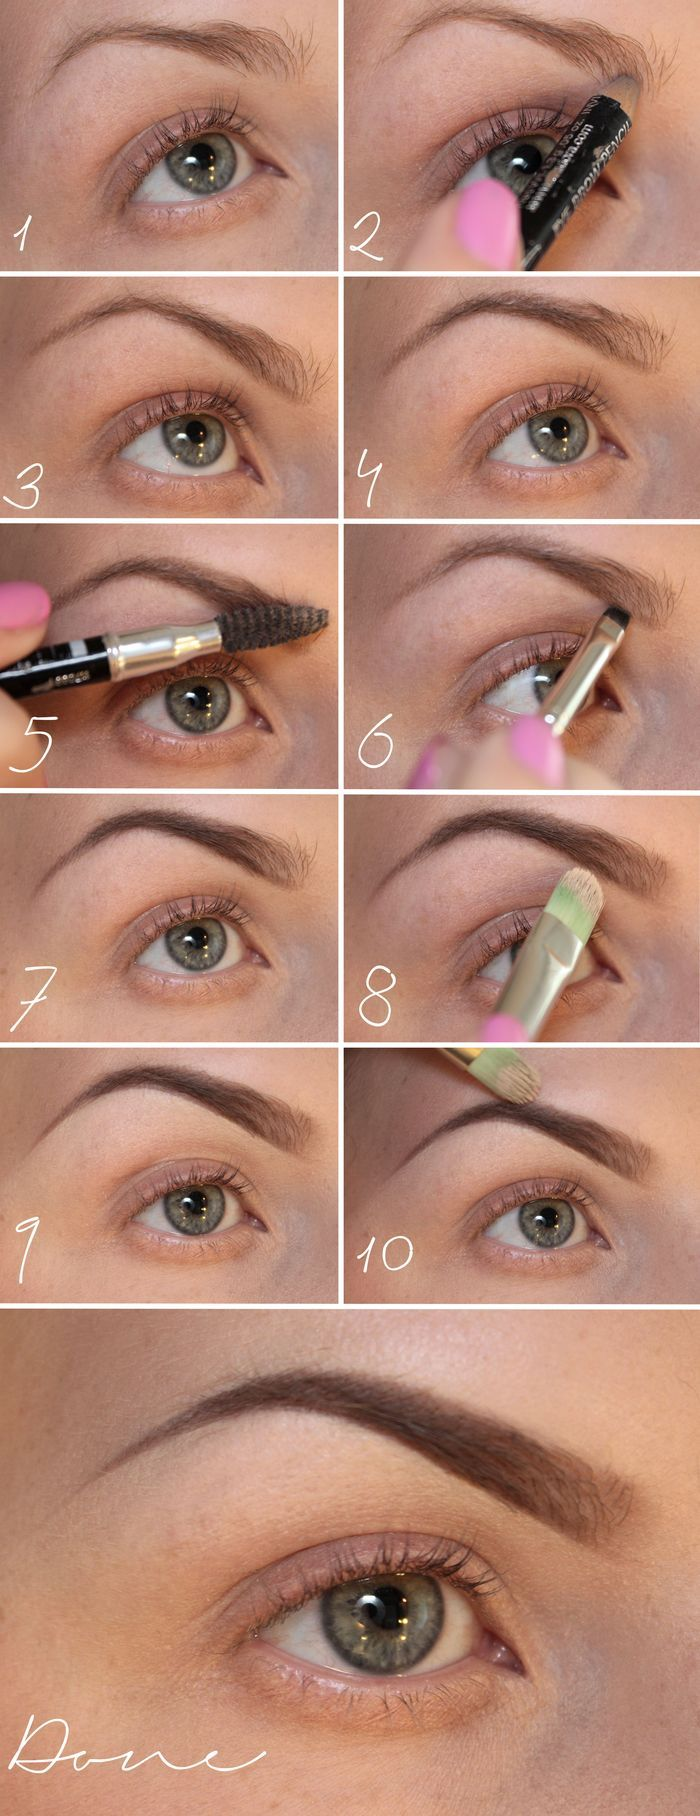 over the top makeup tutorial